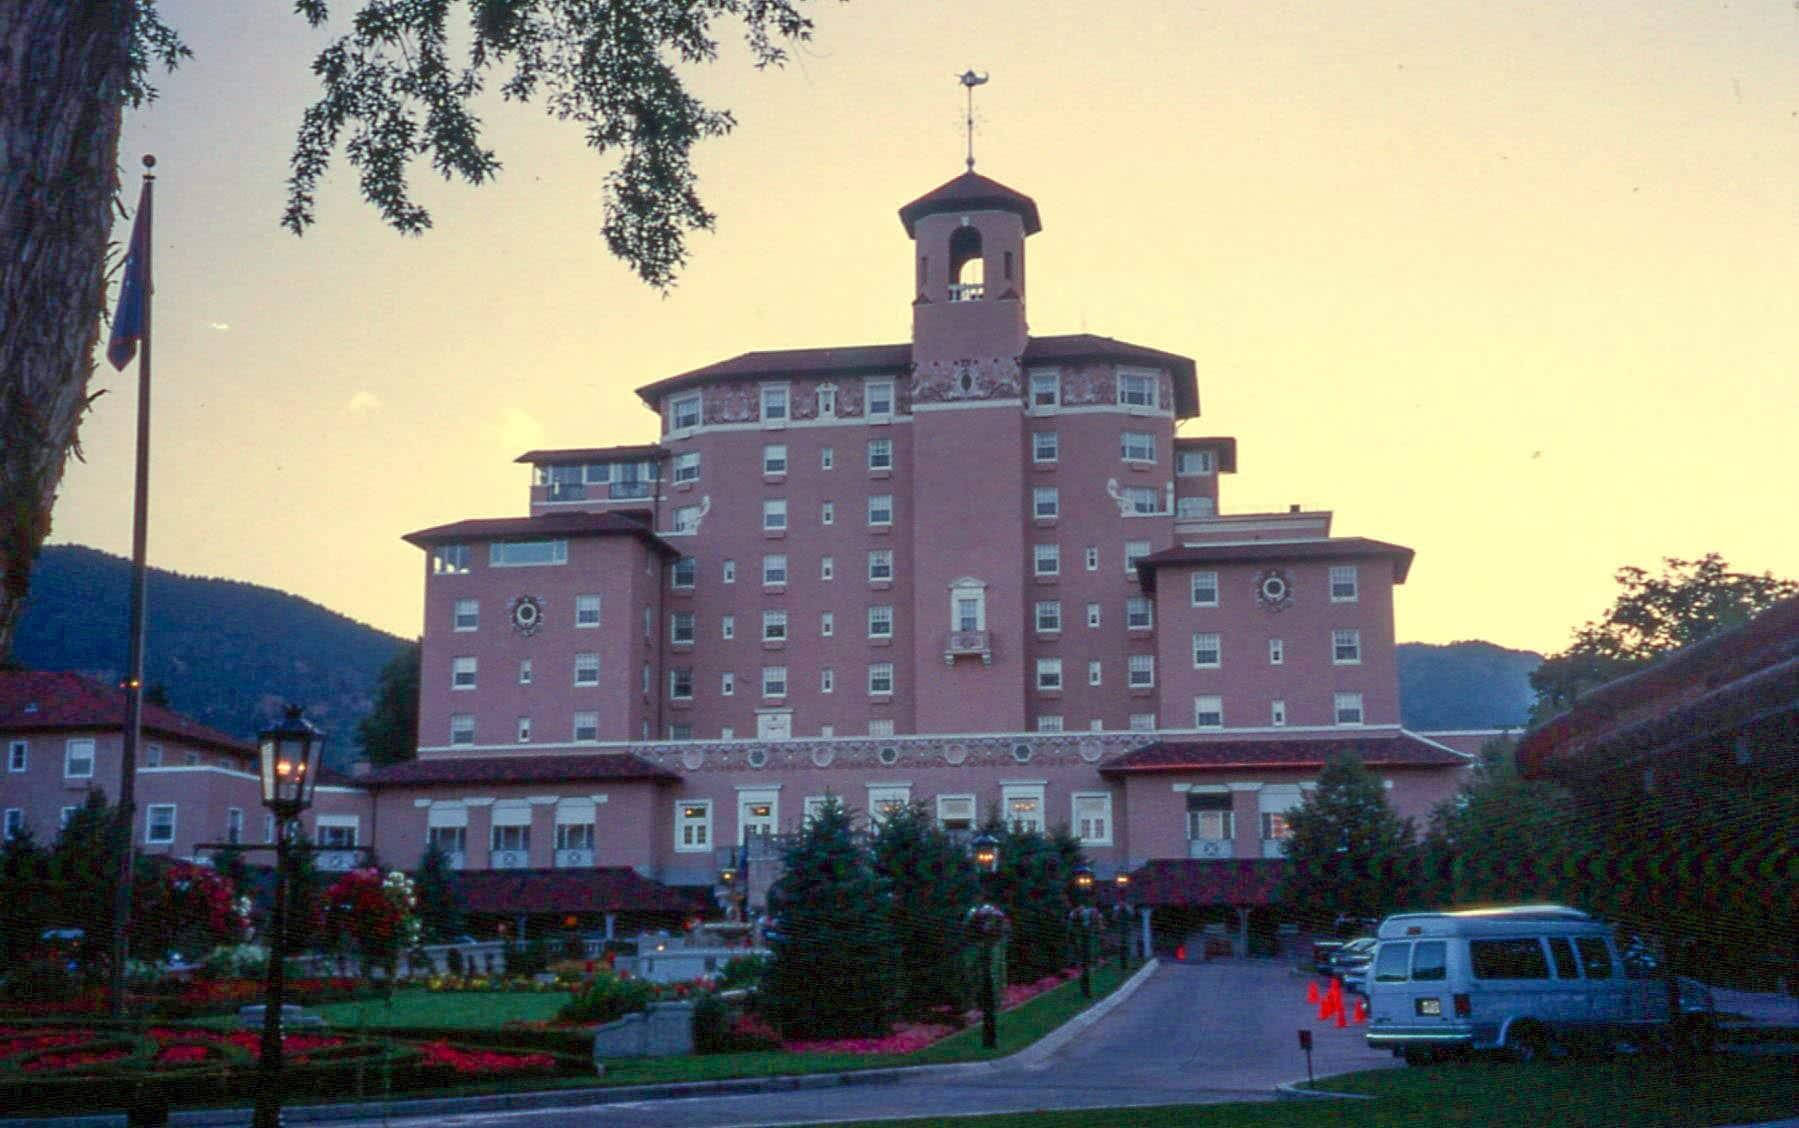 Broadmoor Hotel Colorado Springs Sunset 1998